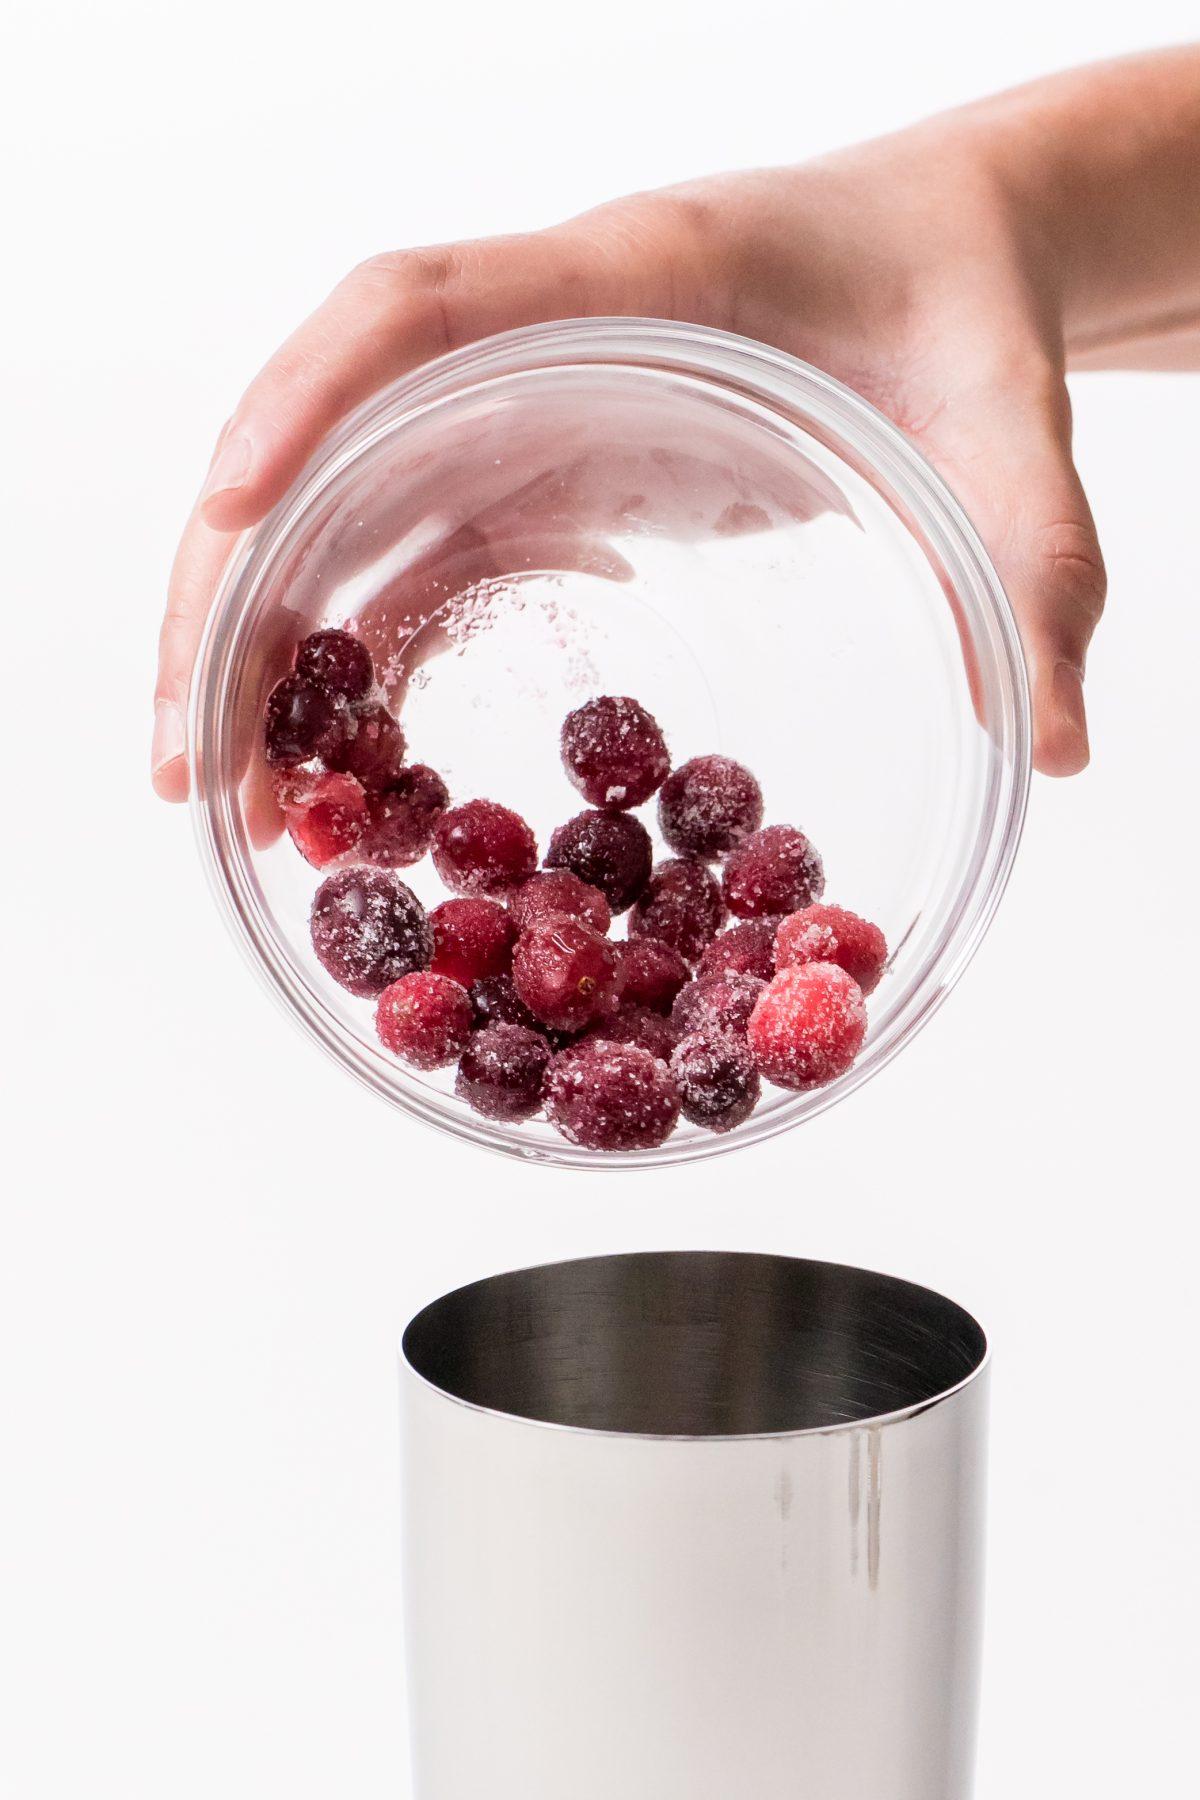 5D4B3711 - Cinnamon Red Mint Cranberry Martini